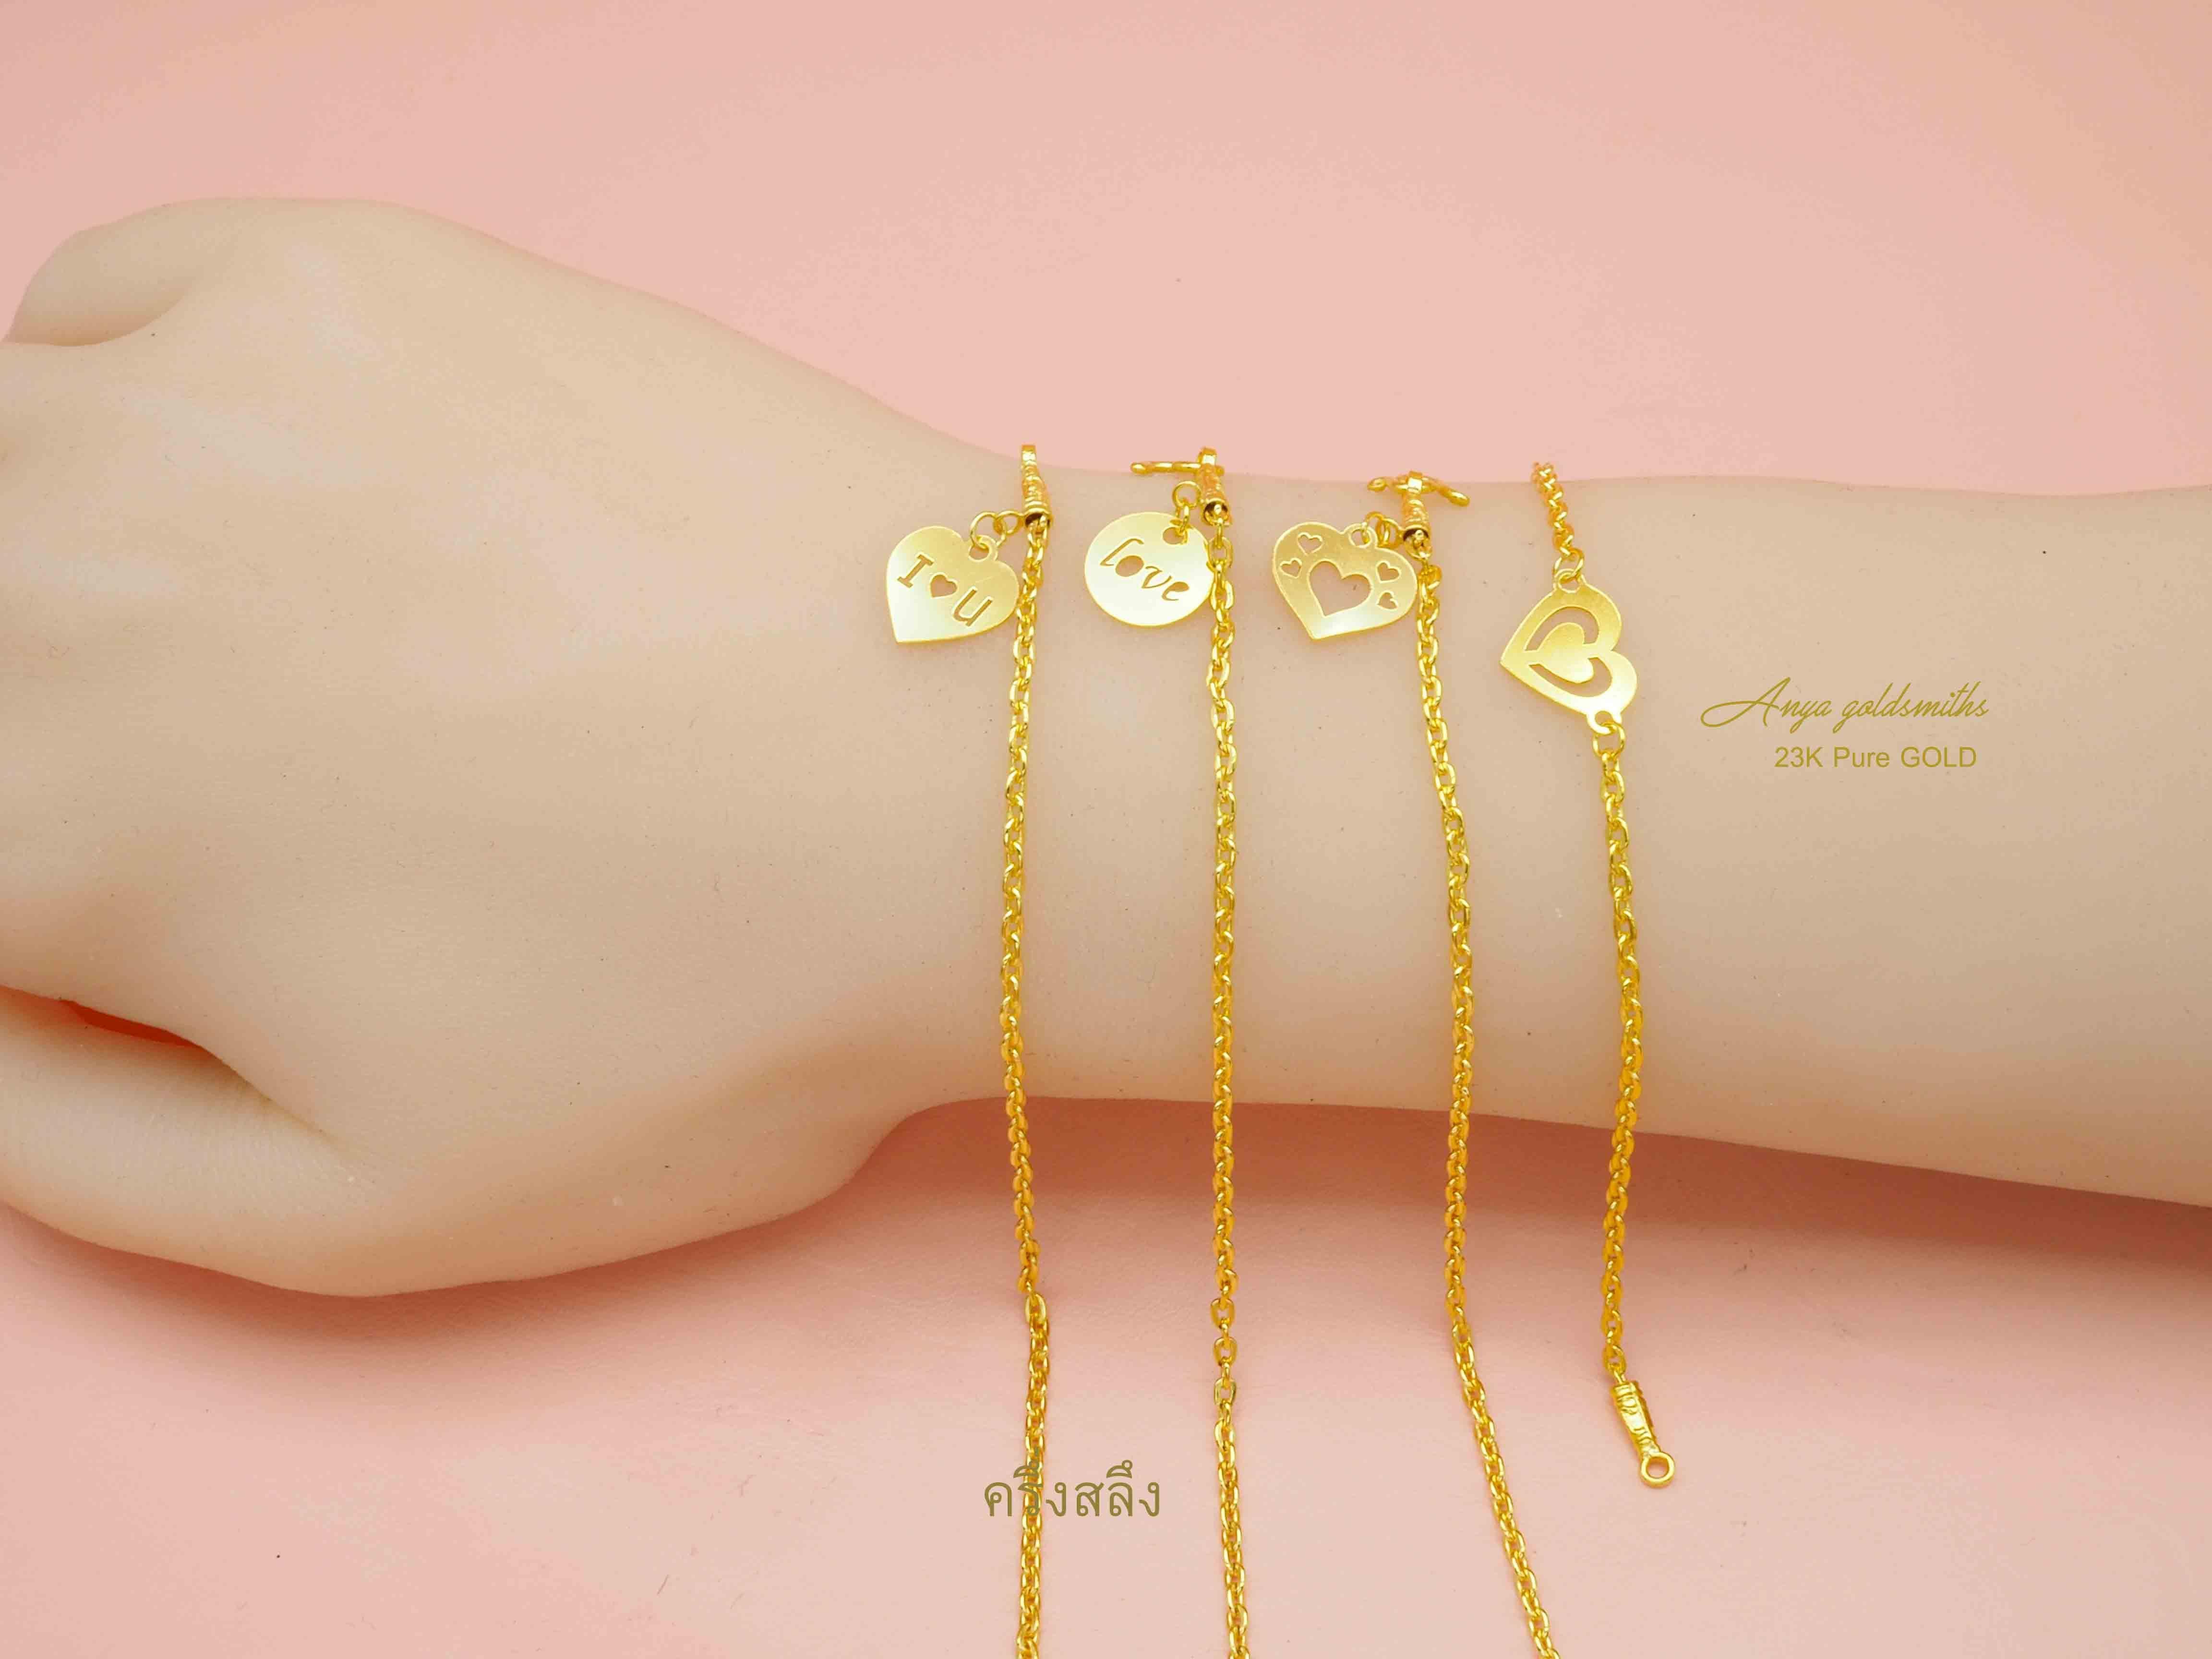 1 9 Grams 23k Pure Gold Bracelet